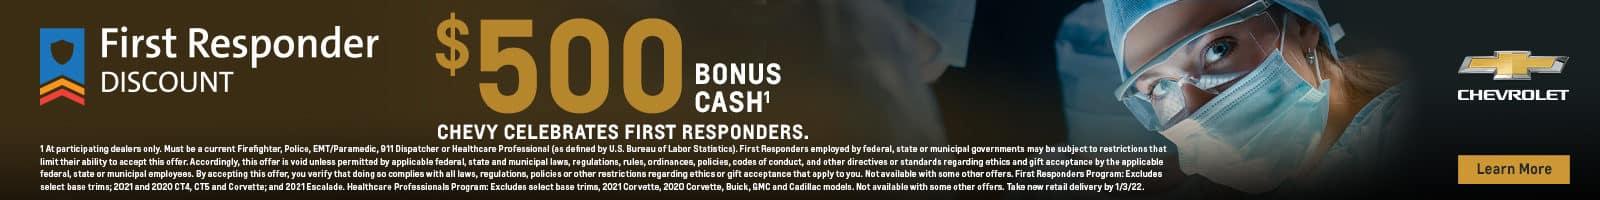 First Responder Discount $500 Bonus Cash